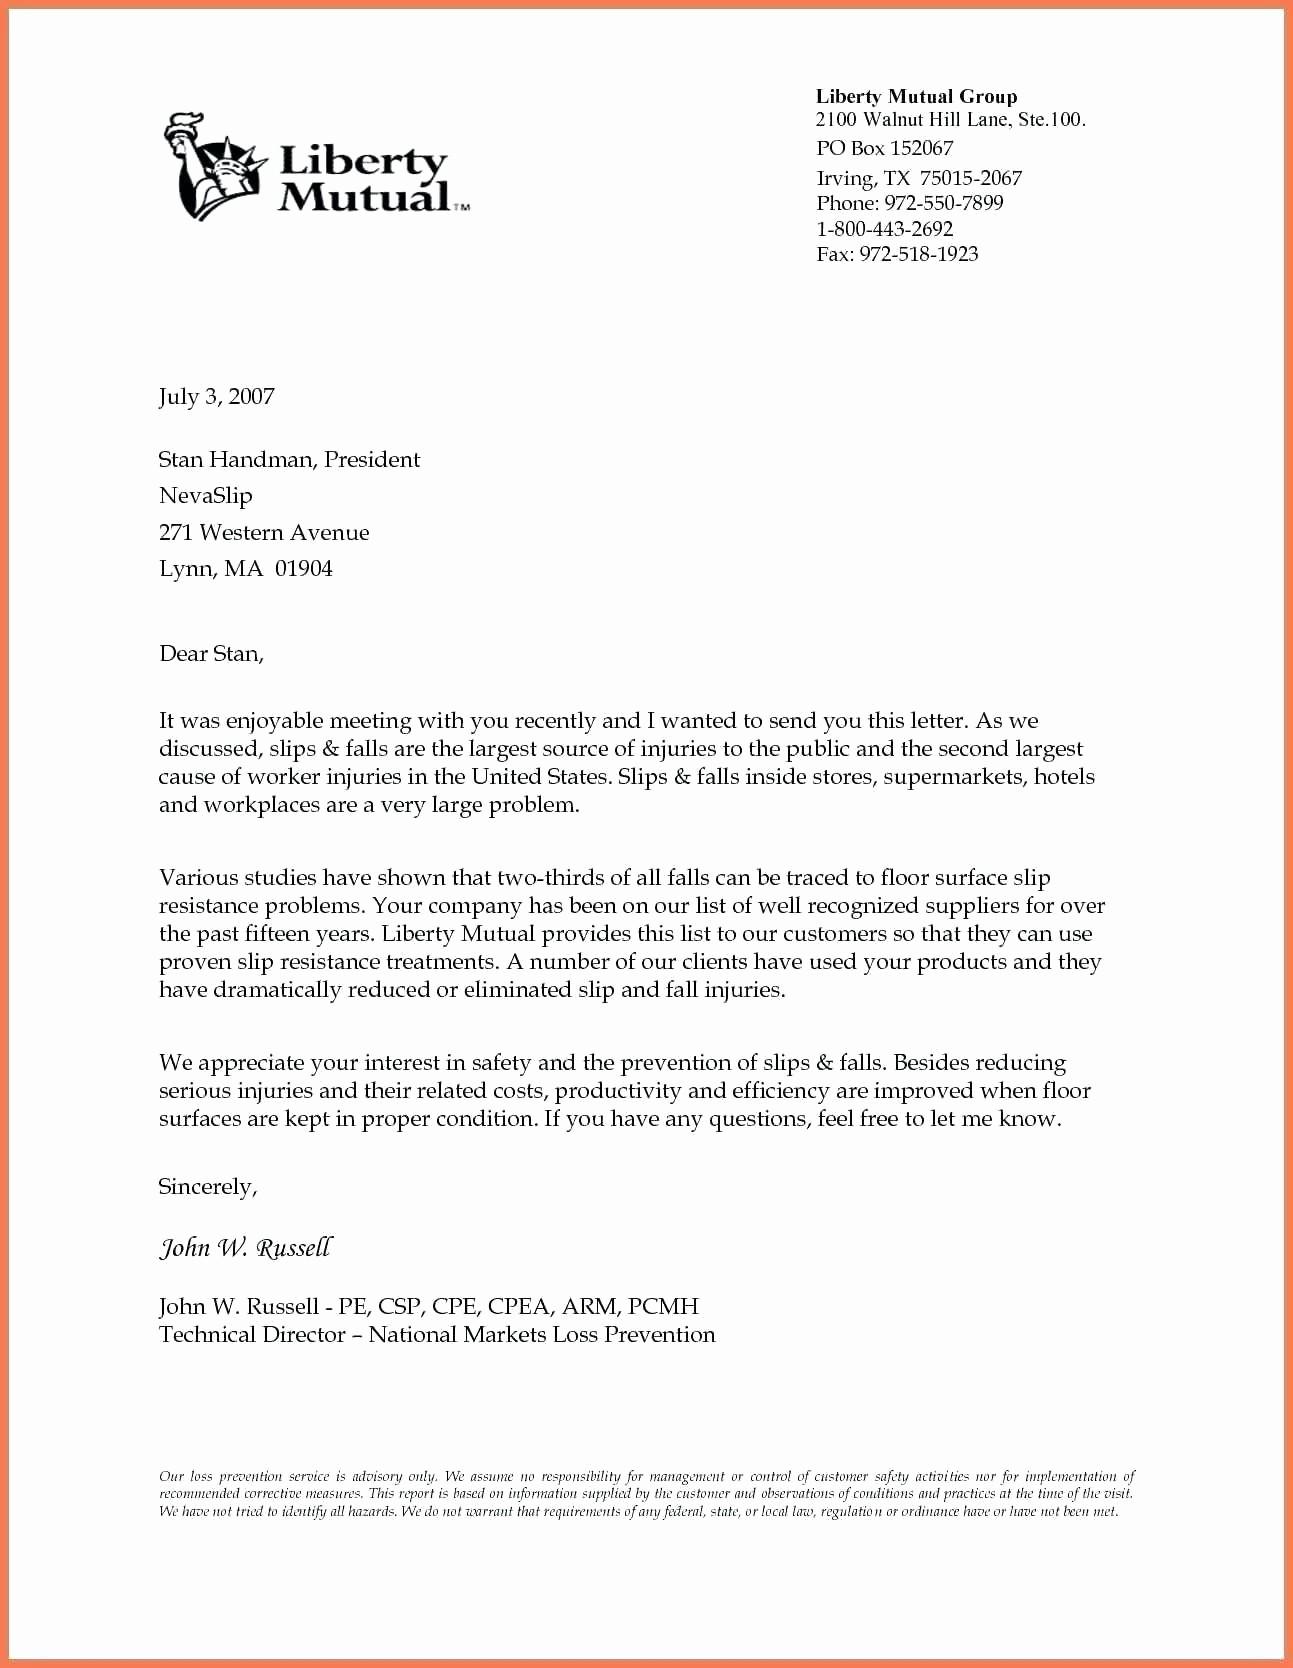 Formal Business Letter format Template Inspirational formal Business Letter Templates 35 formal Business